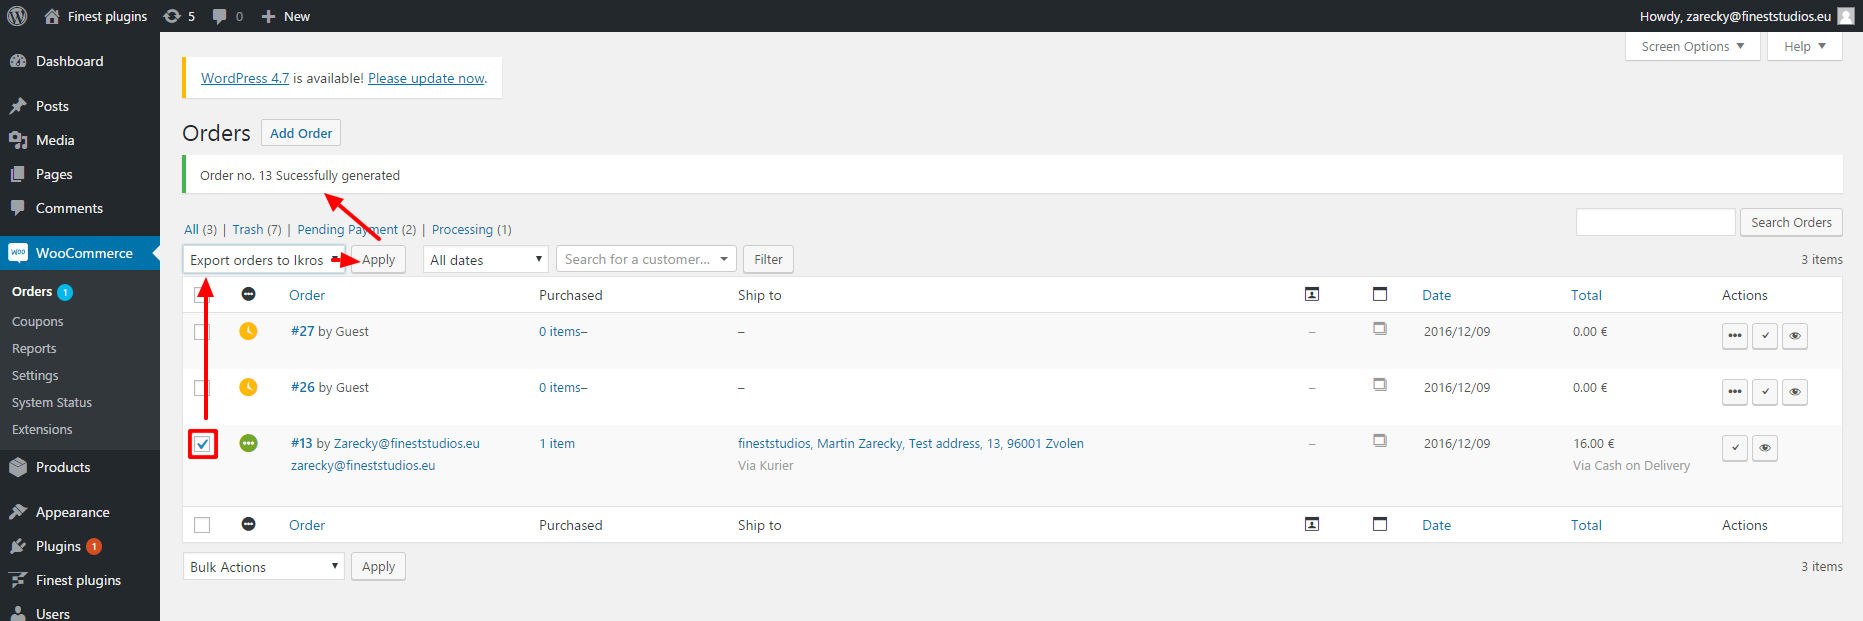 Plugin usage /assets/screenshot-2.png